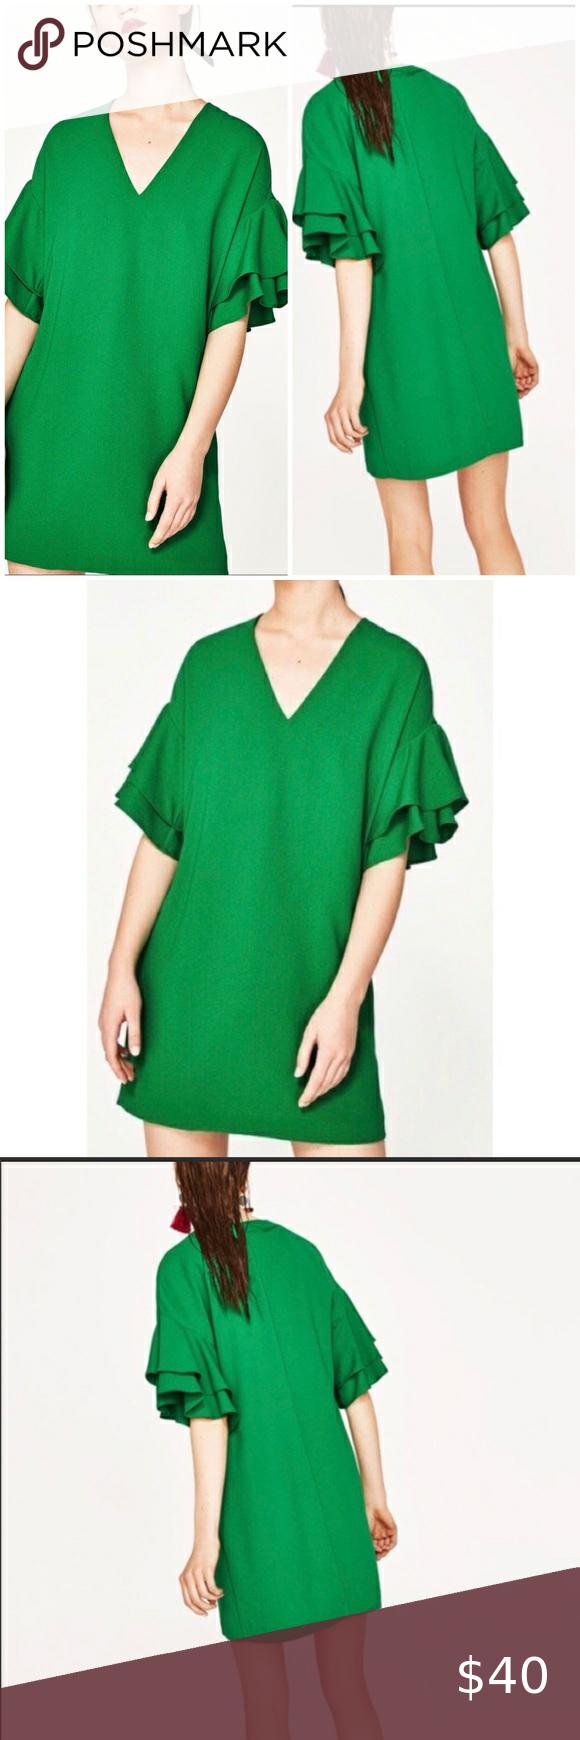 Women/'s NWT ZARA W//B Collection SMALL Cap Sleeve VNeck Blue//Green//Tan Floral Top